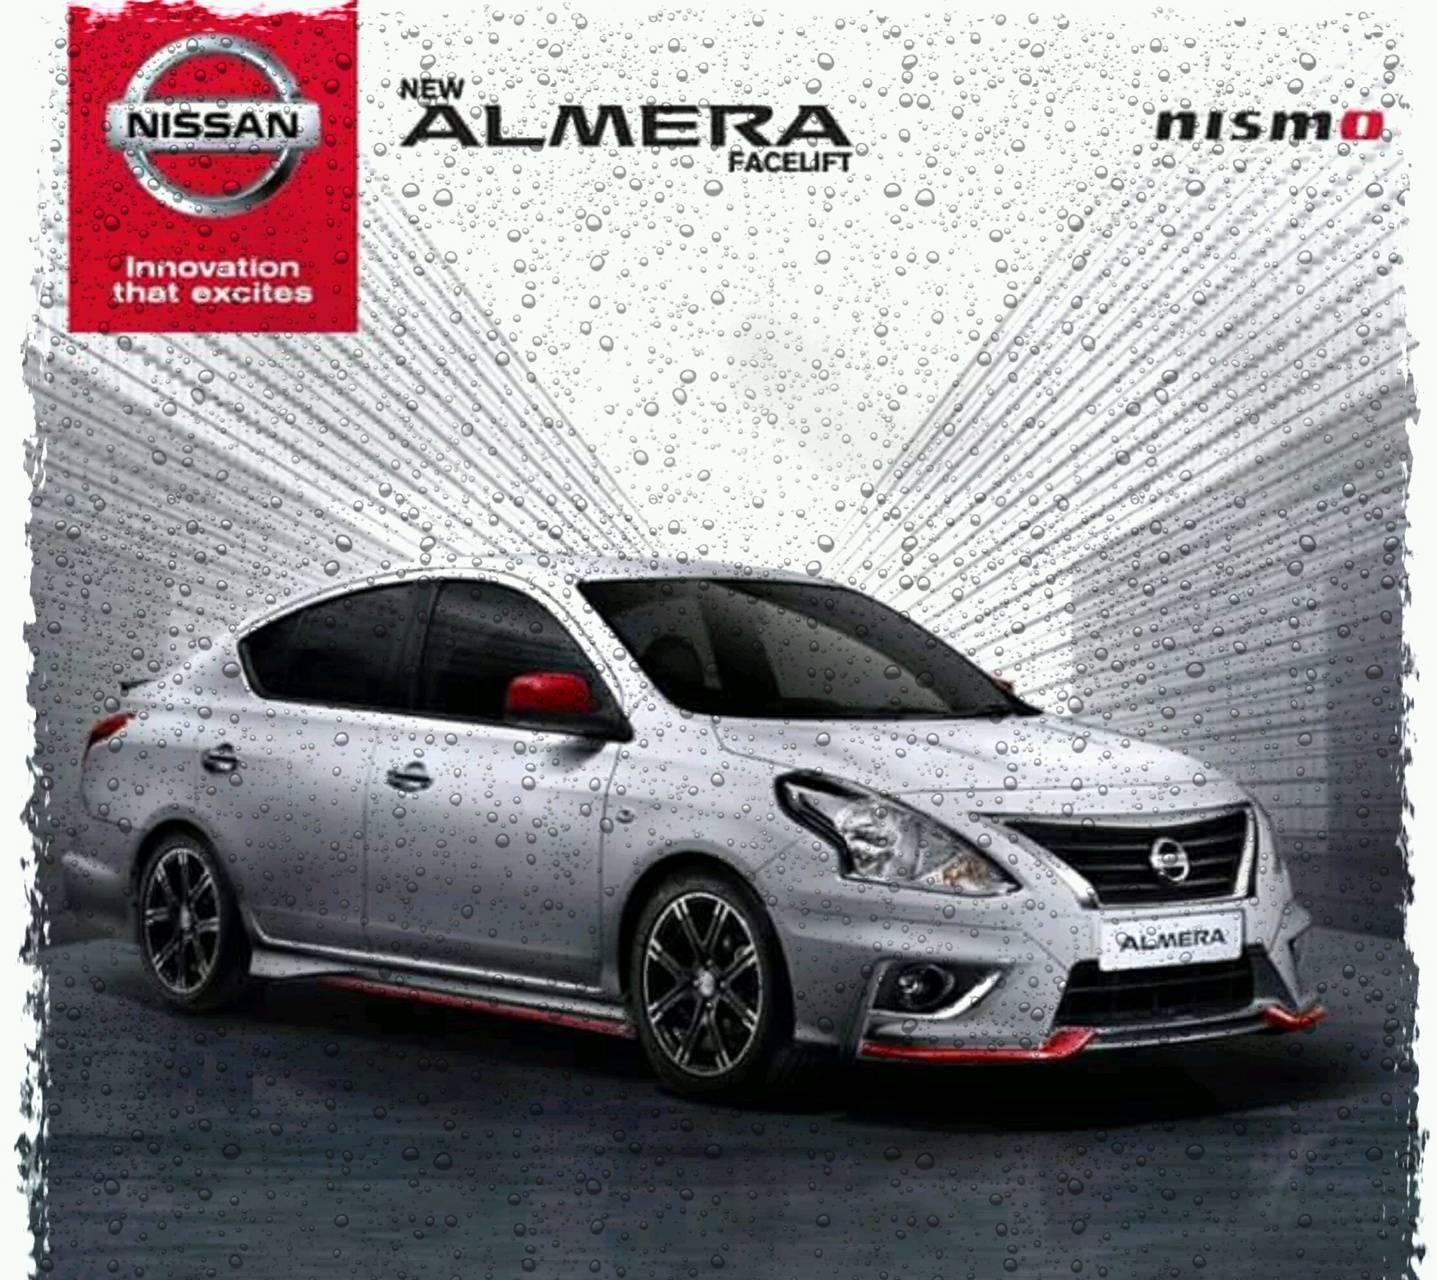 Almera facelift